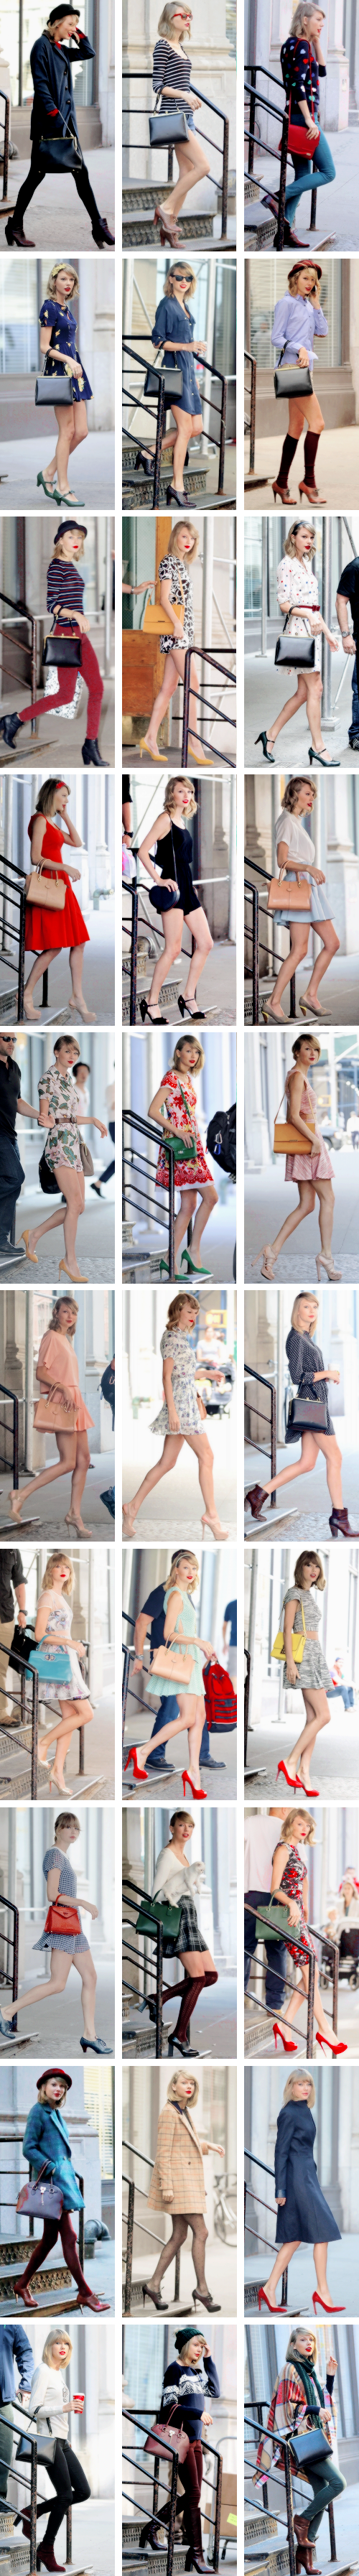 A Taylor Swift fashion collage ♥♥♥♥♥